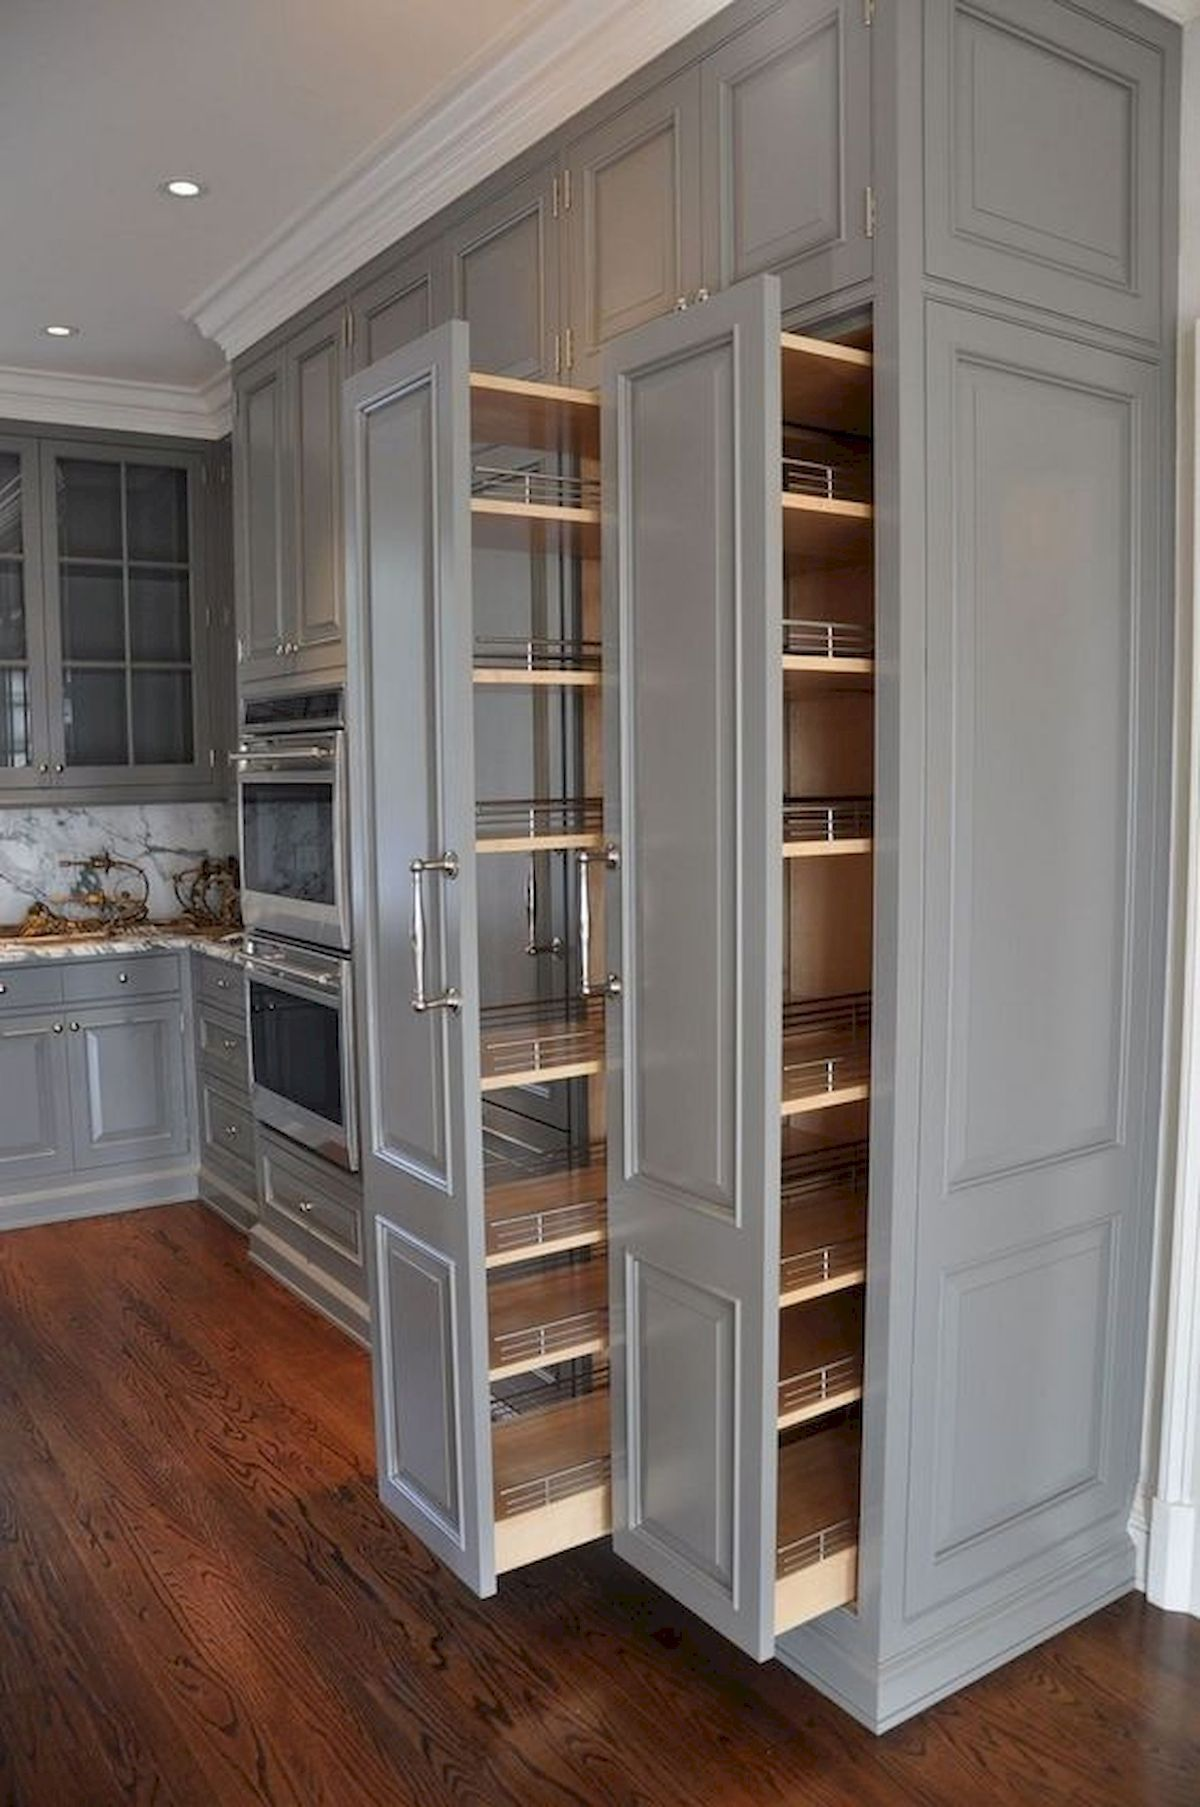 80 Lovely Diy Projects Furniture Kitchen Storage Design Ideas 34 Kitchen Pullout Kitchen Design Kitchen Cabinet Design